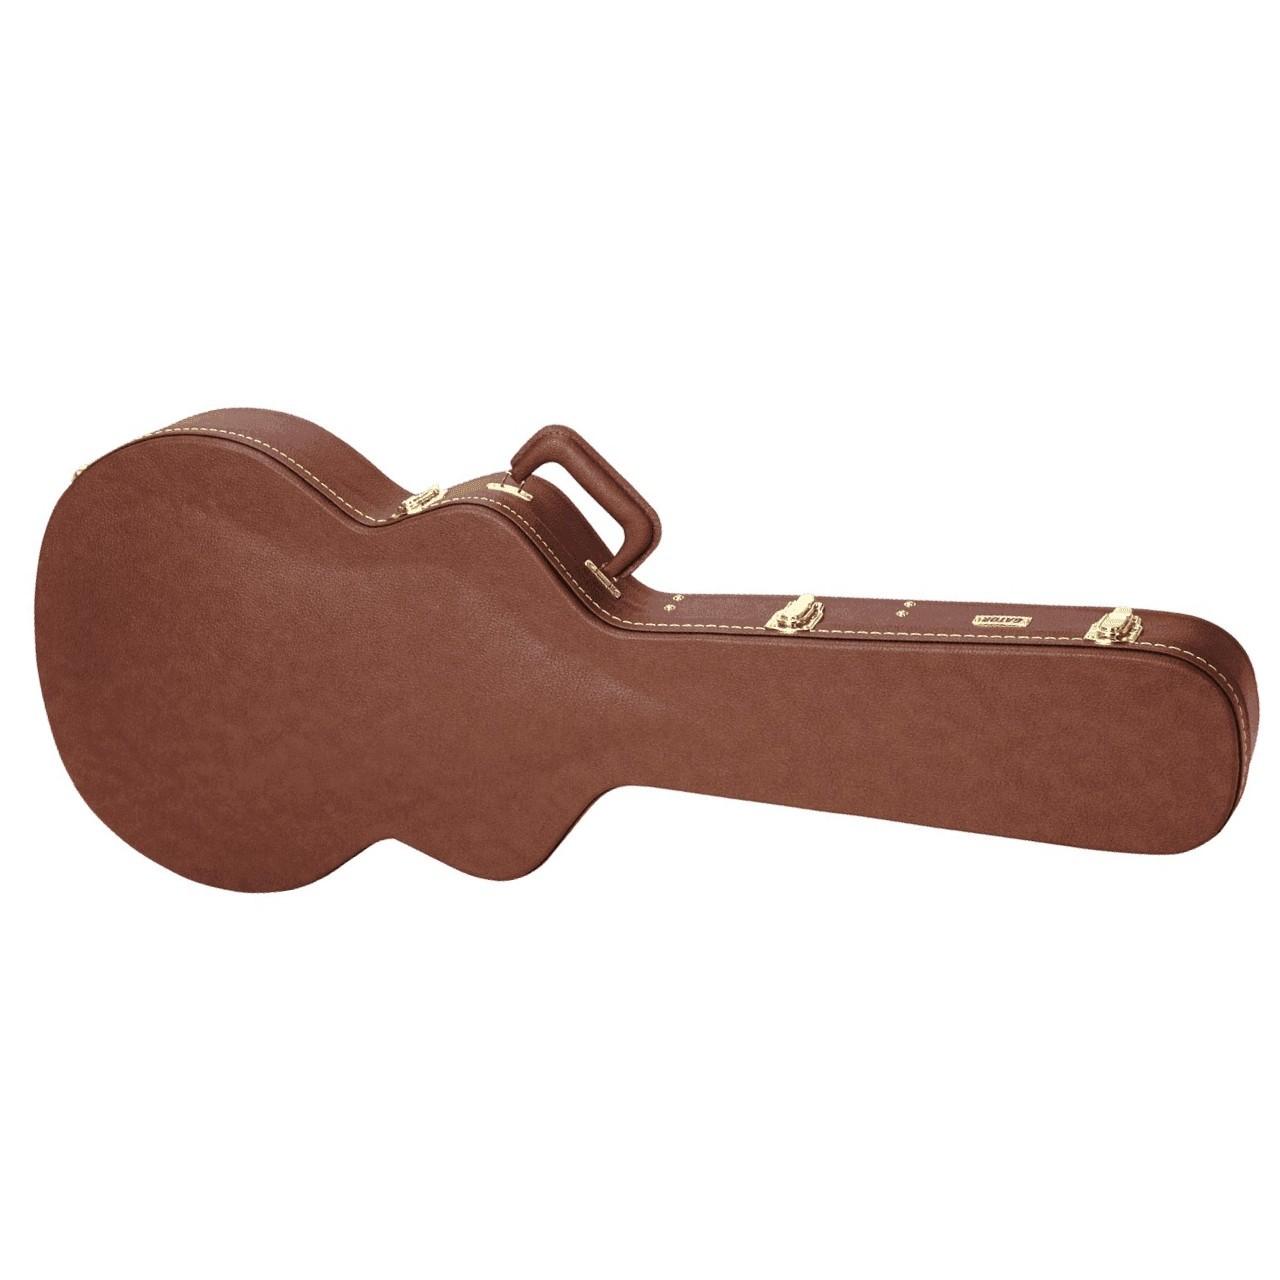 GATOR Etui Guitare Bois Deluxe GW Type 335